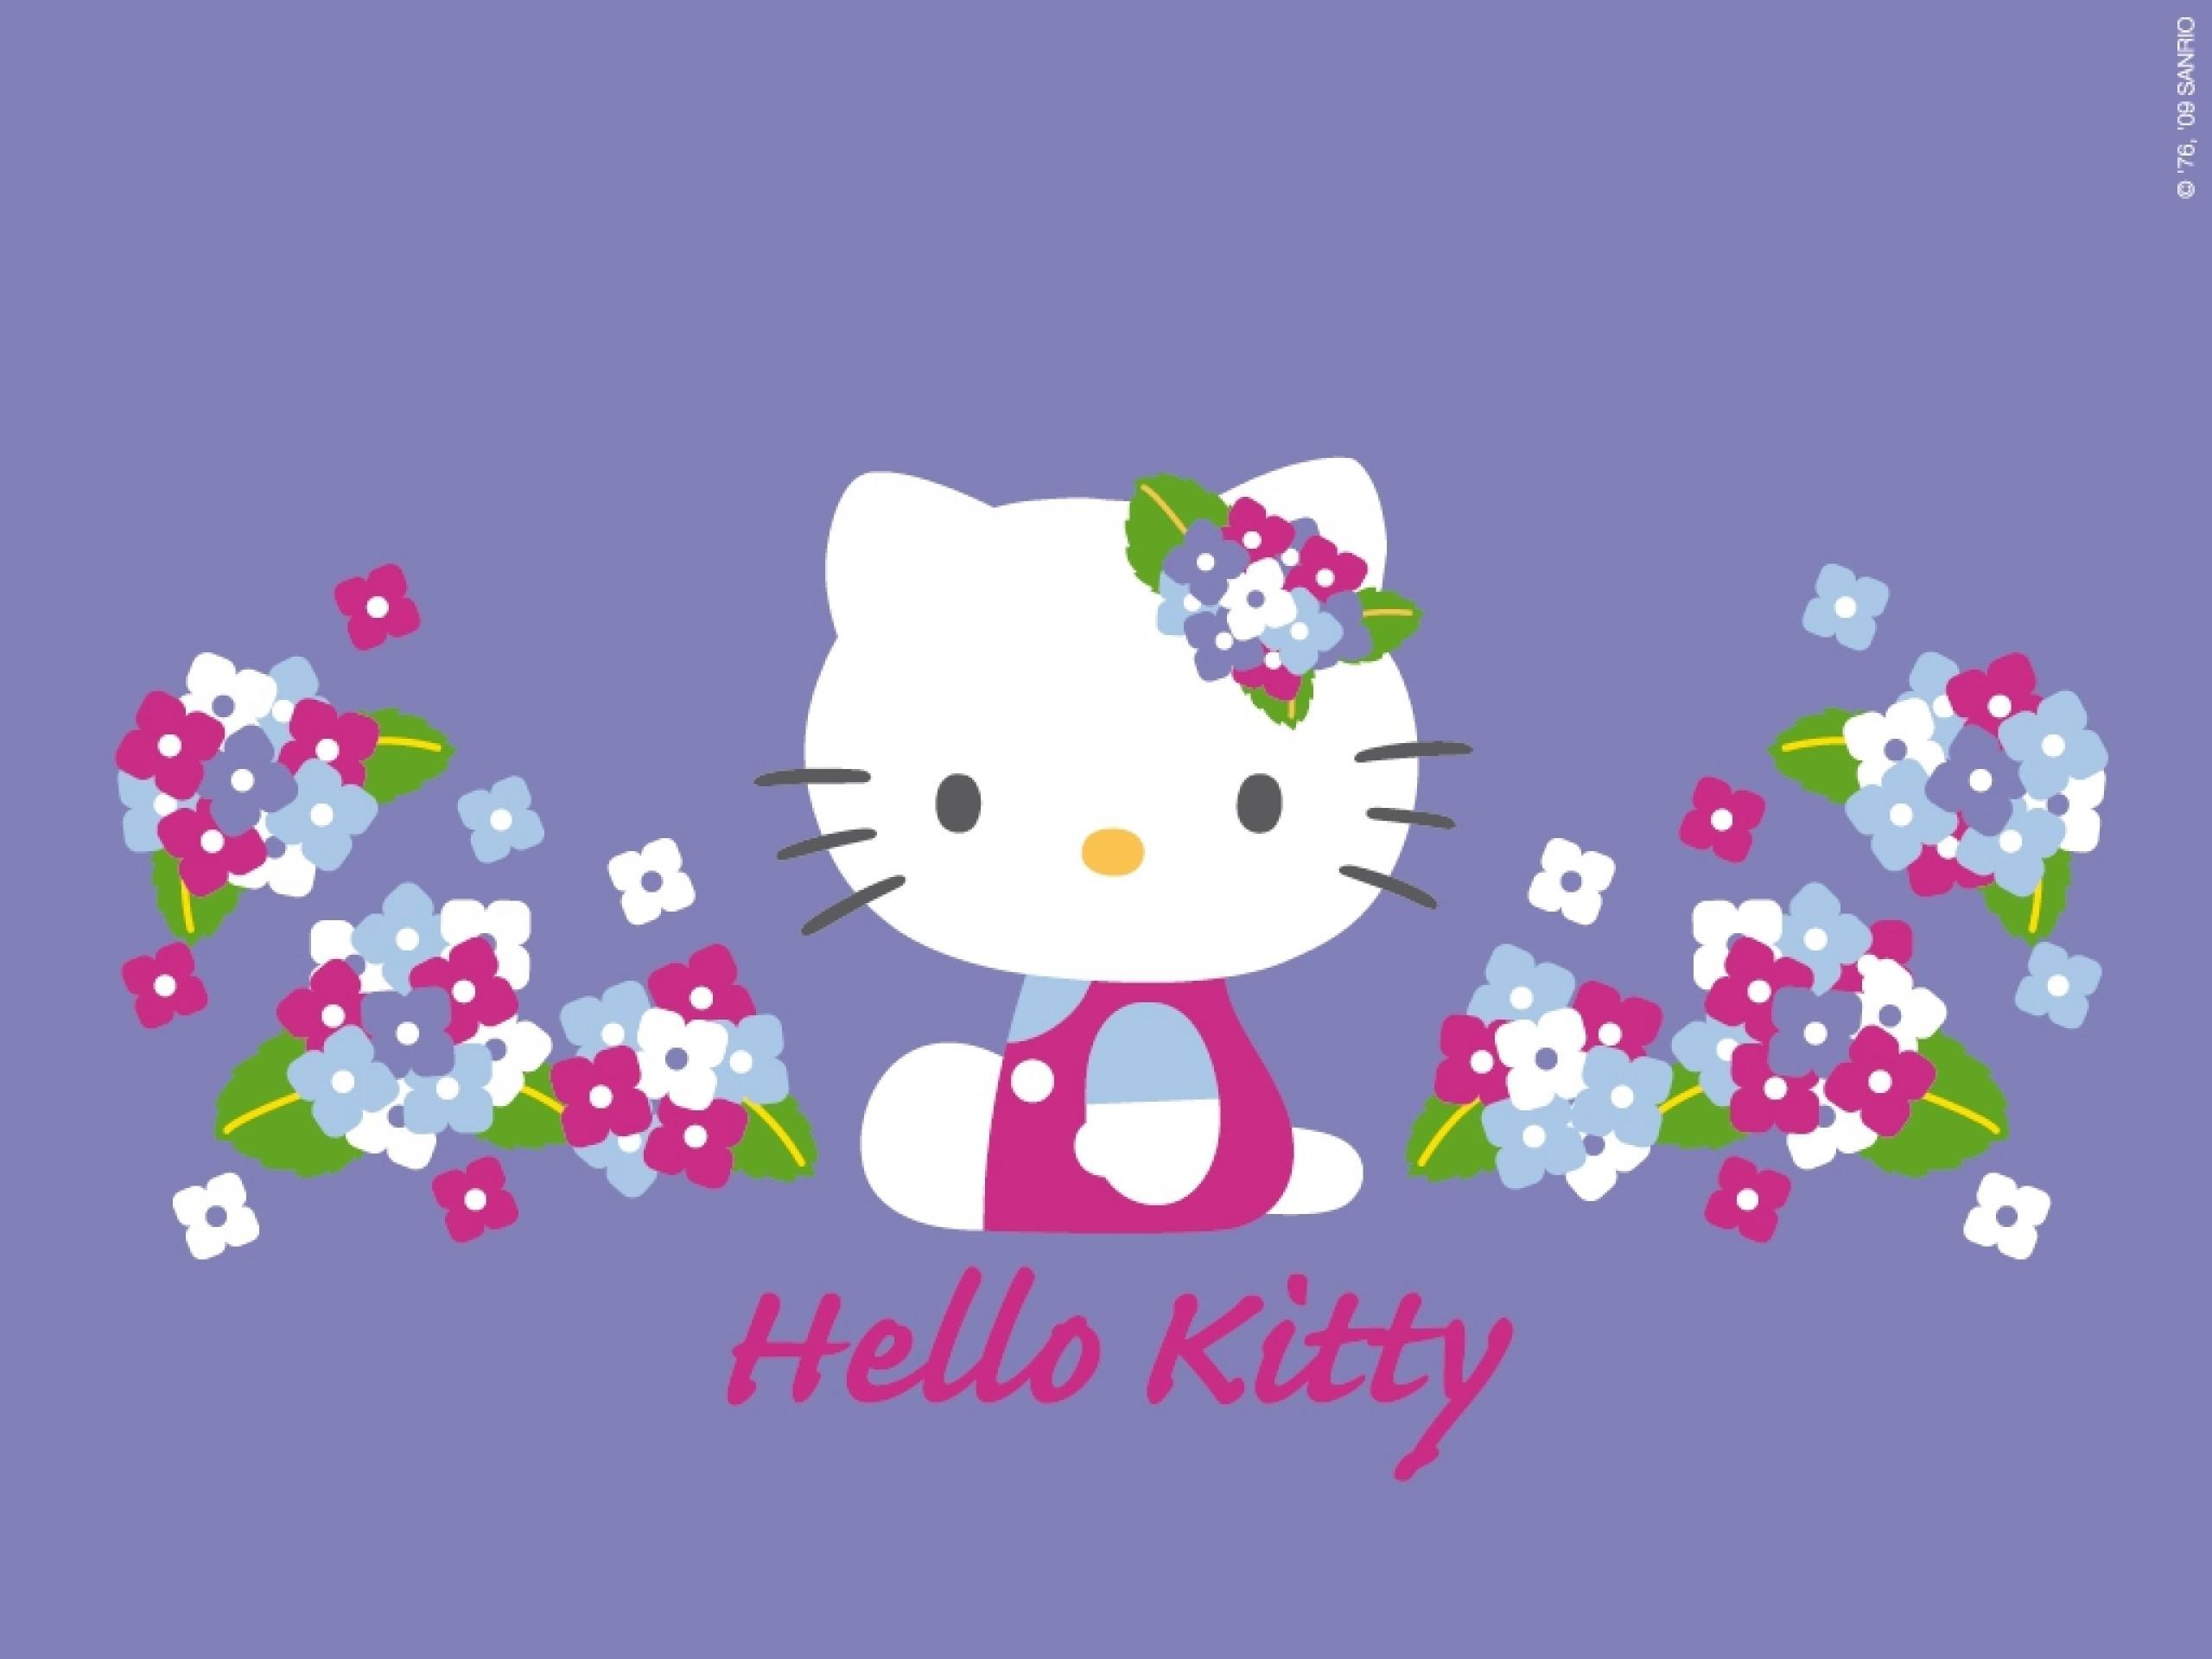 Wonderful Wallpaper Hello Kitty Purple - 95122  Gallery_46484.jpg